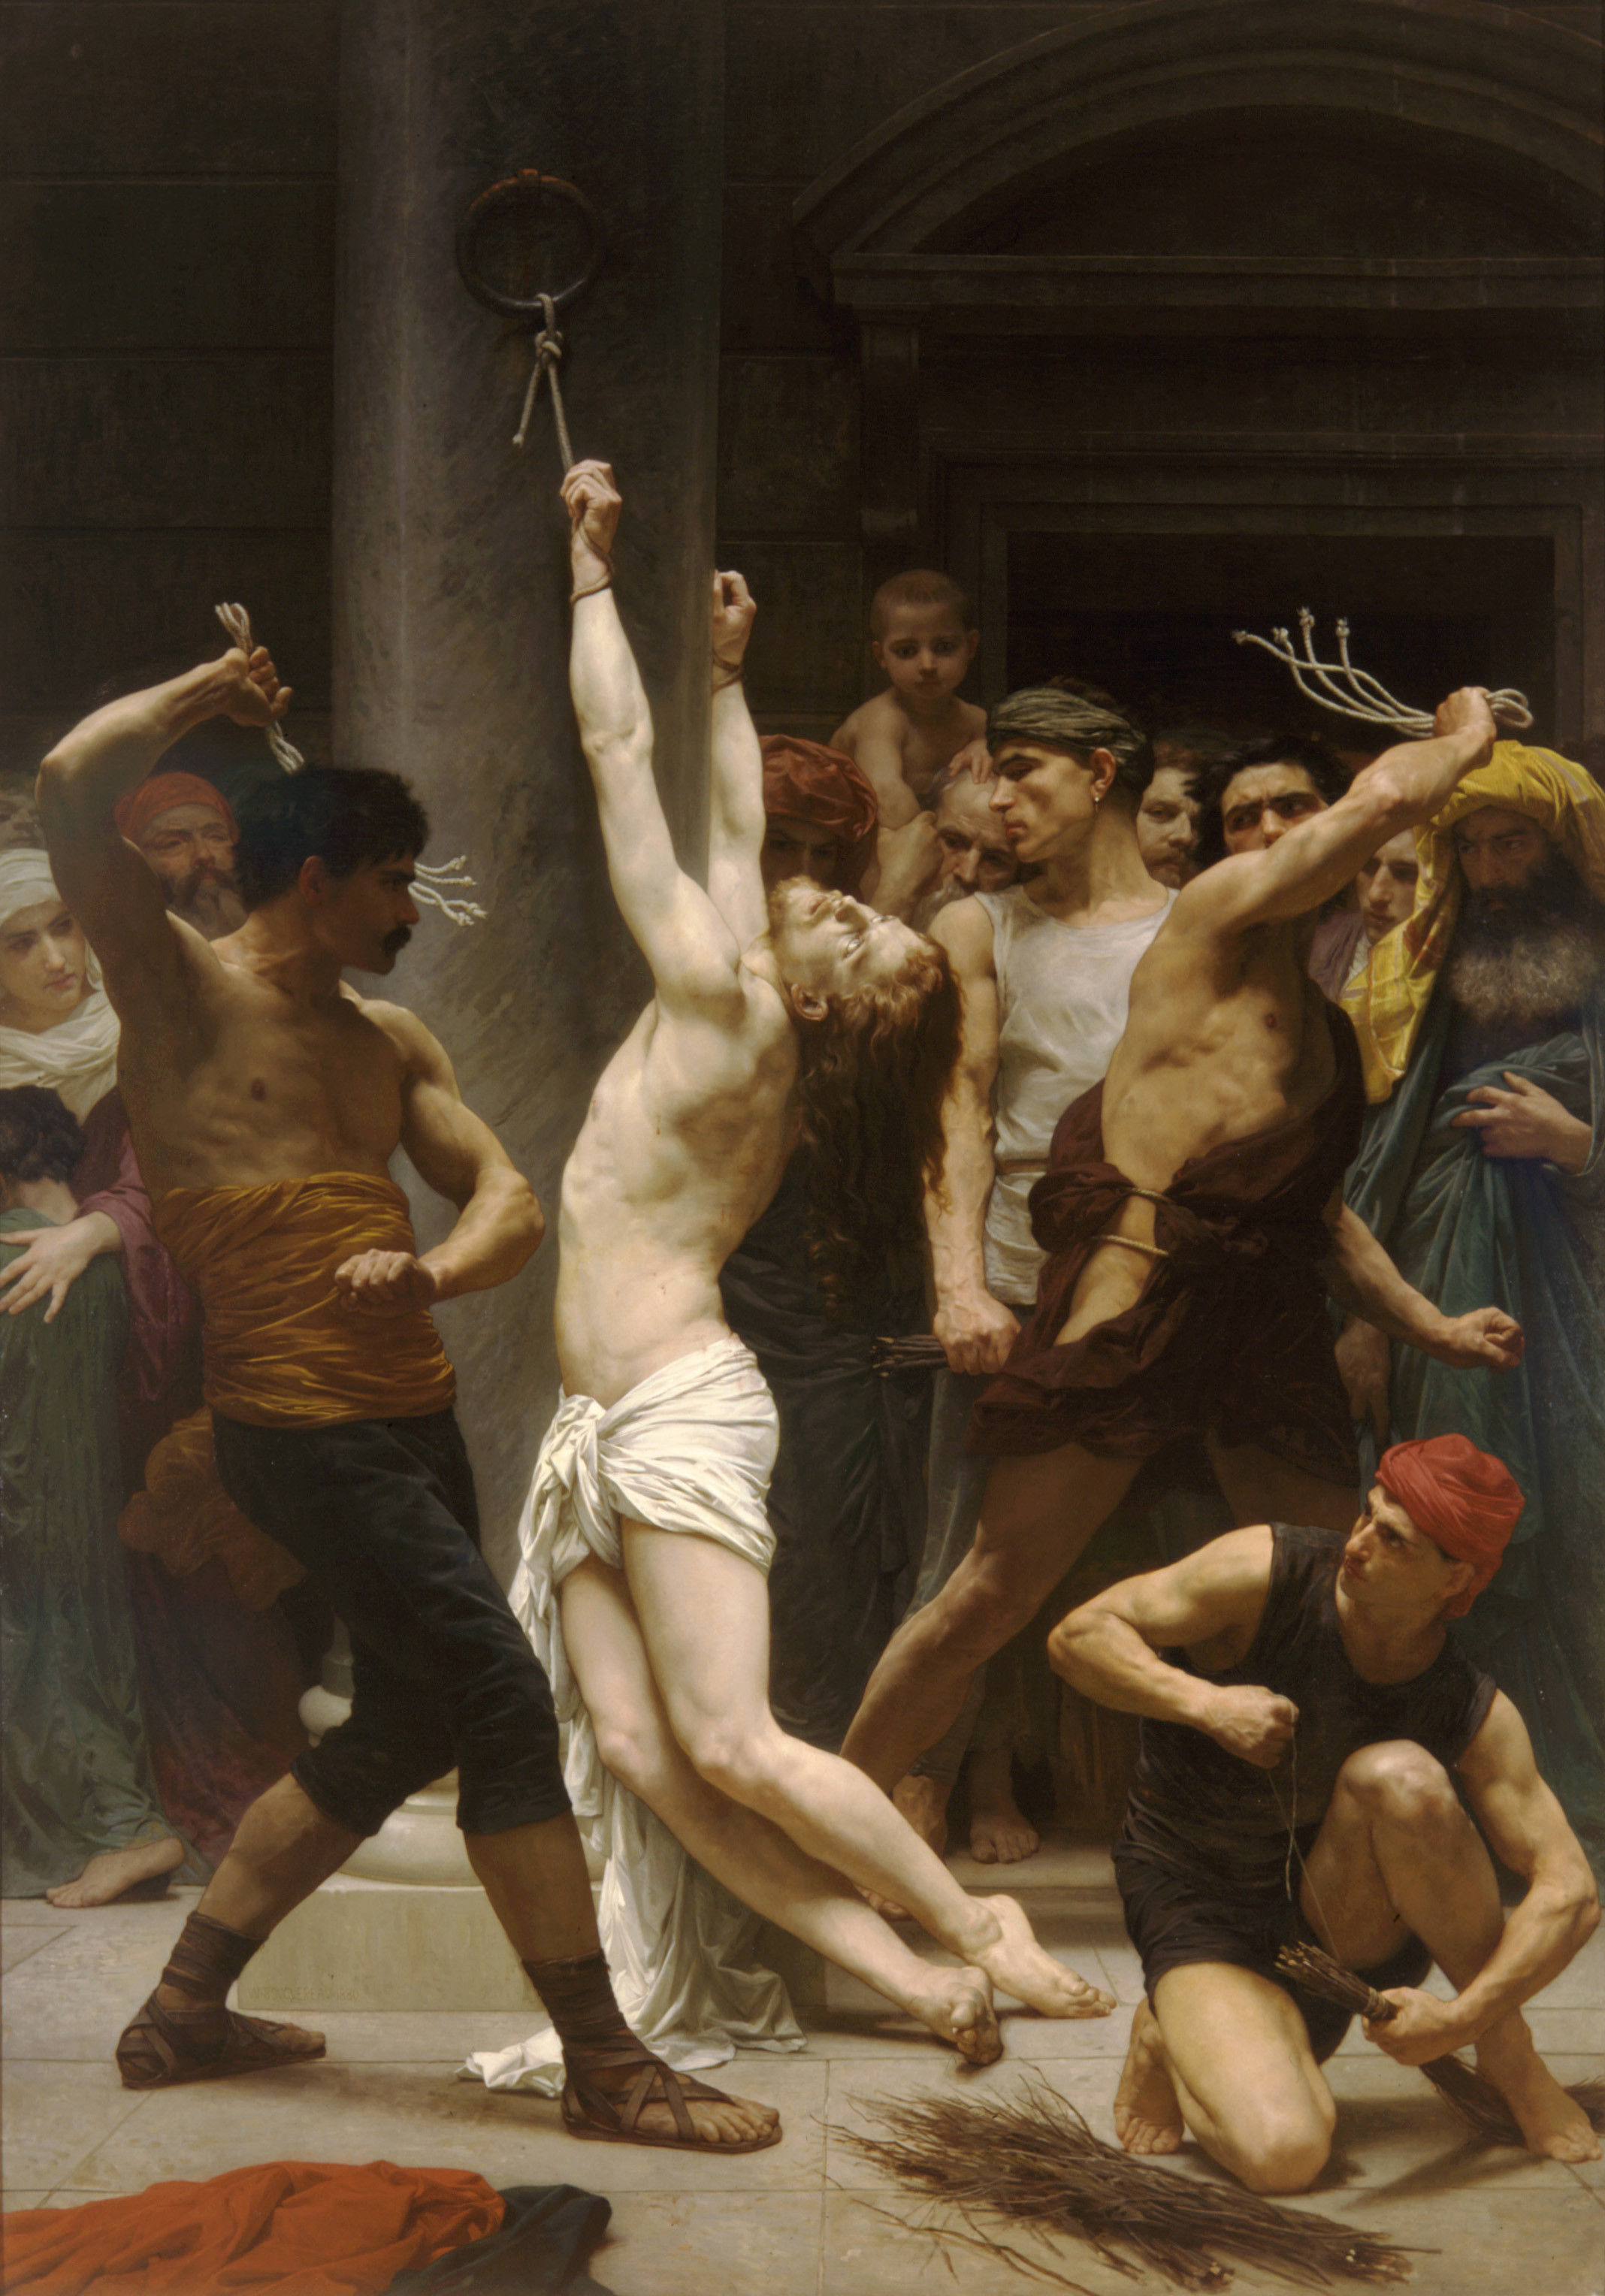 Jesus Christ Angry 0607 Jesus Christ Beaten 0611 …